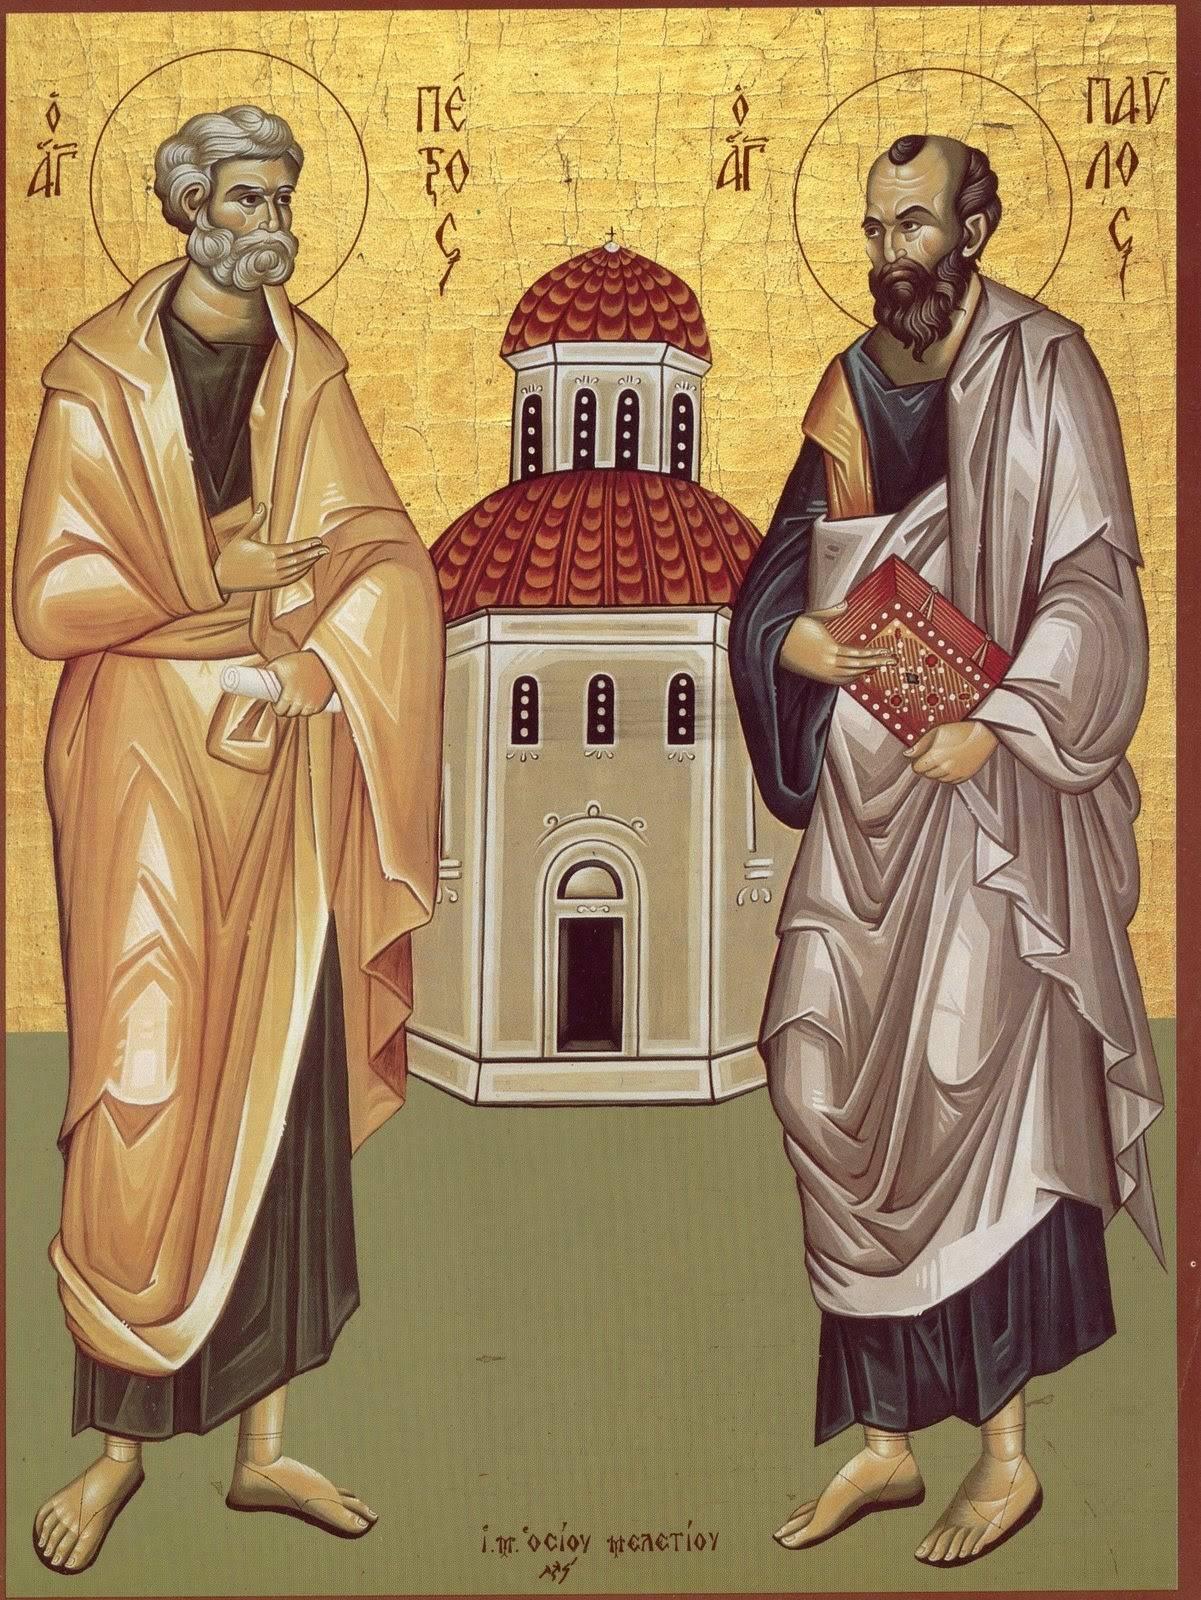 Acatistul Sfintilor Apostoli Petru si Pavel